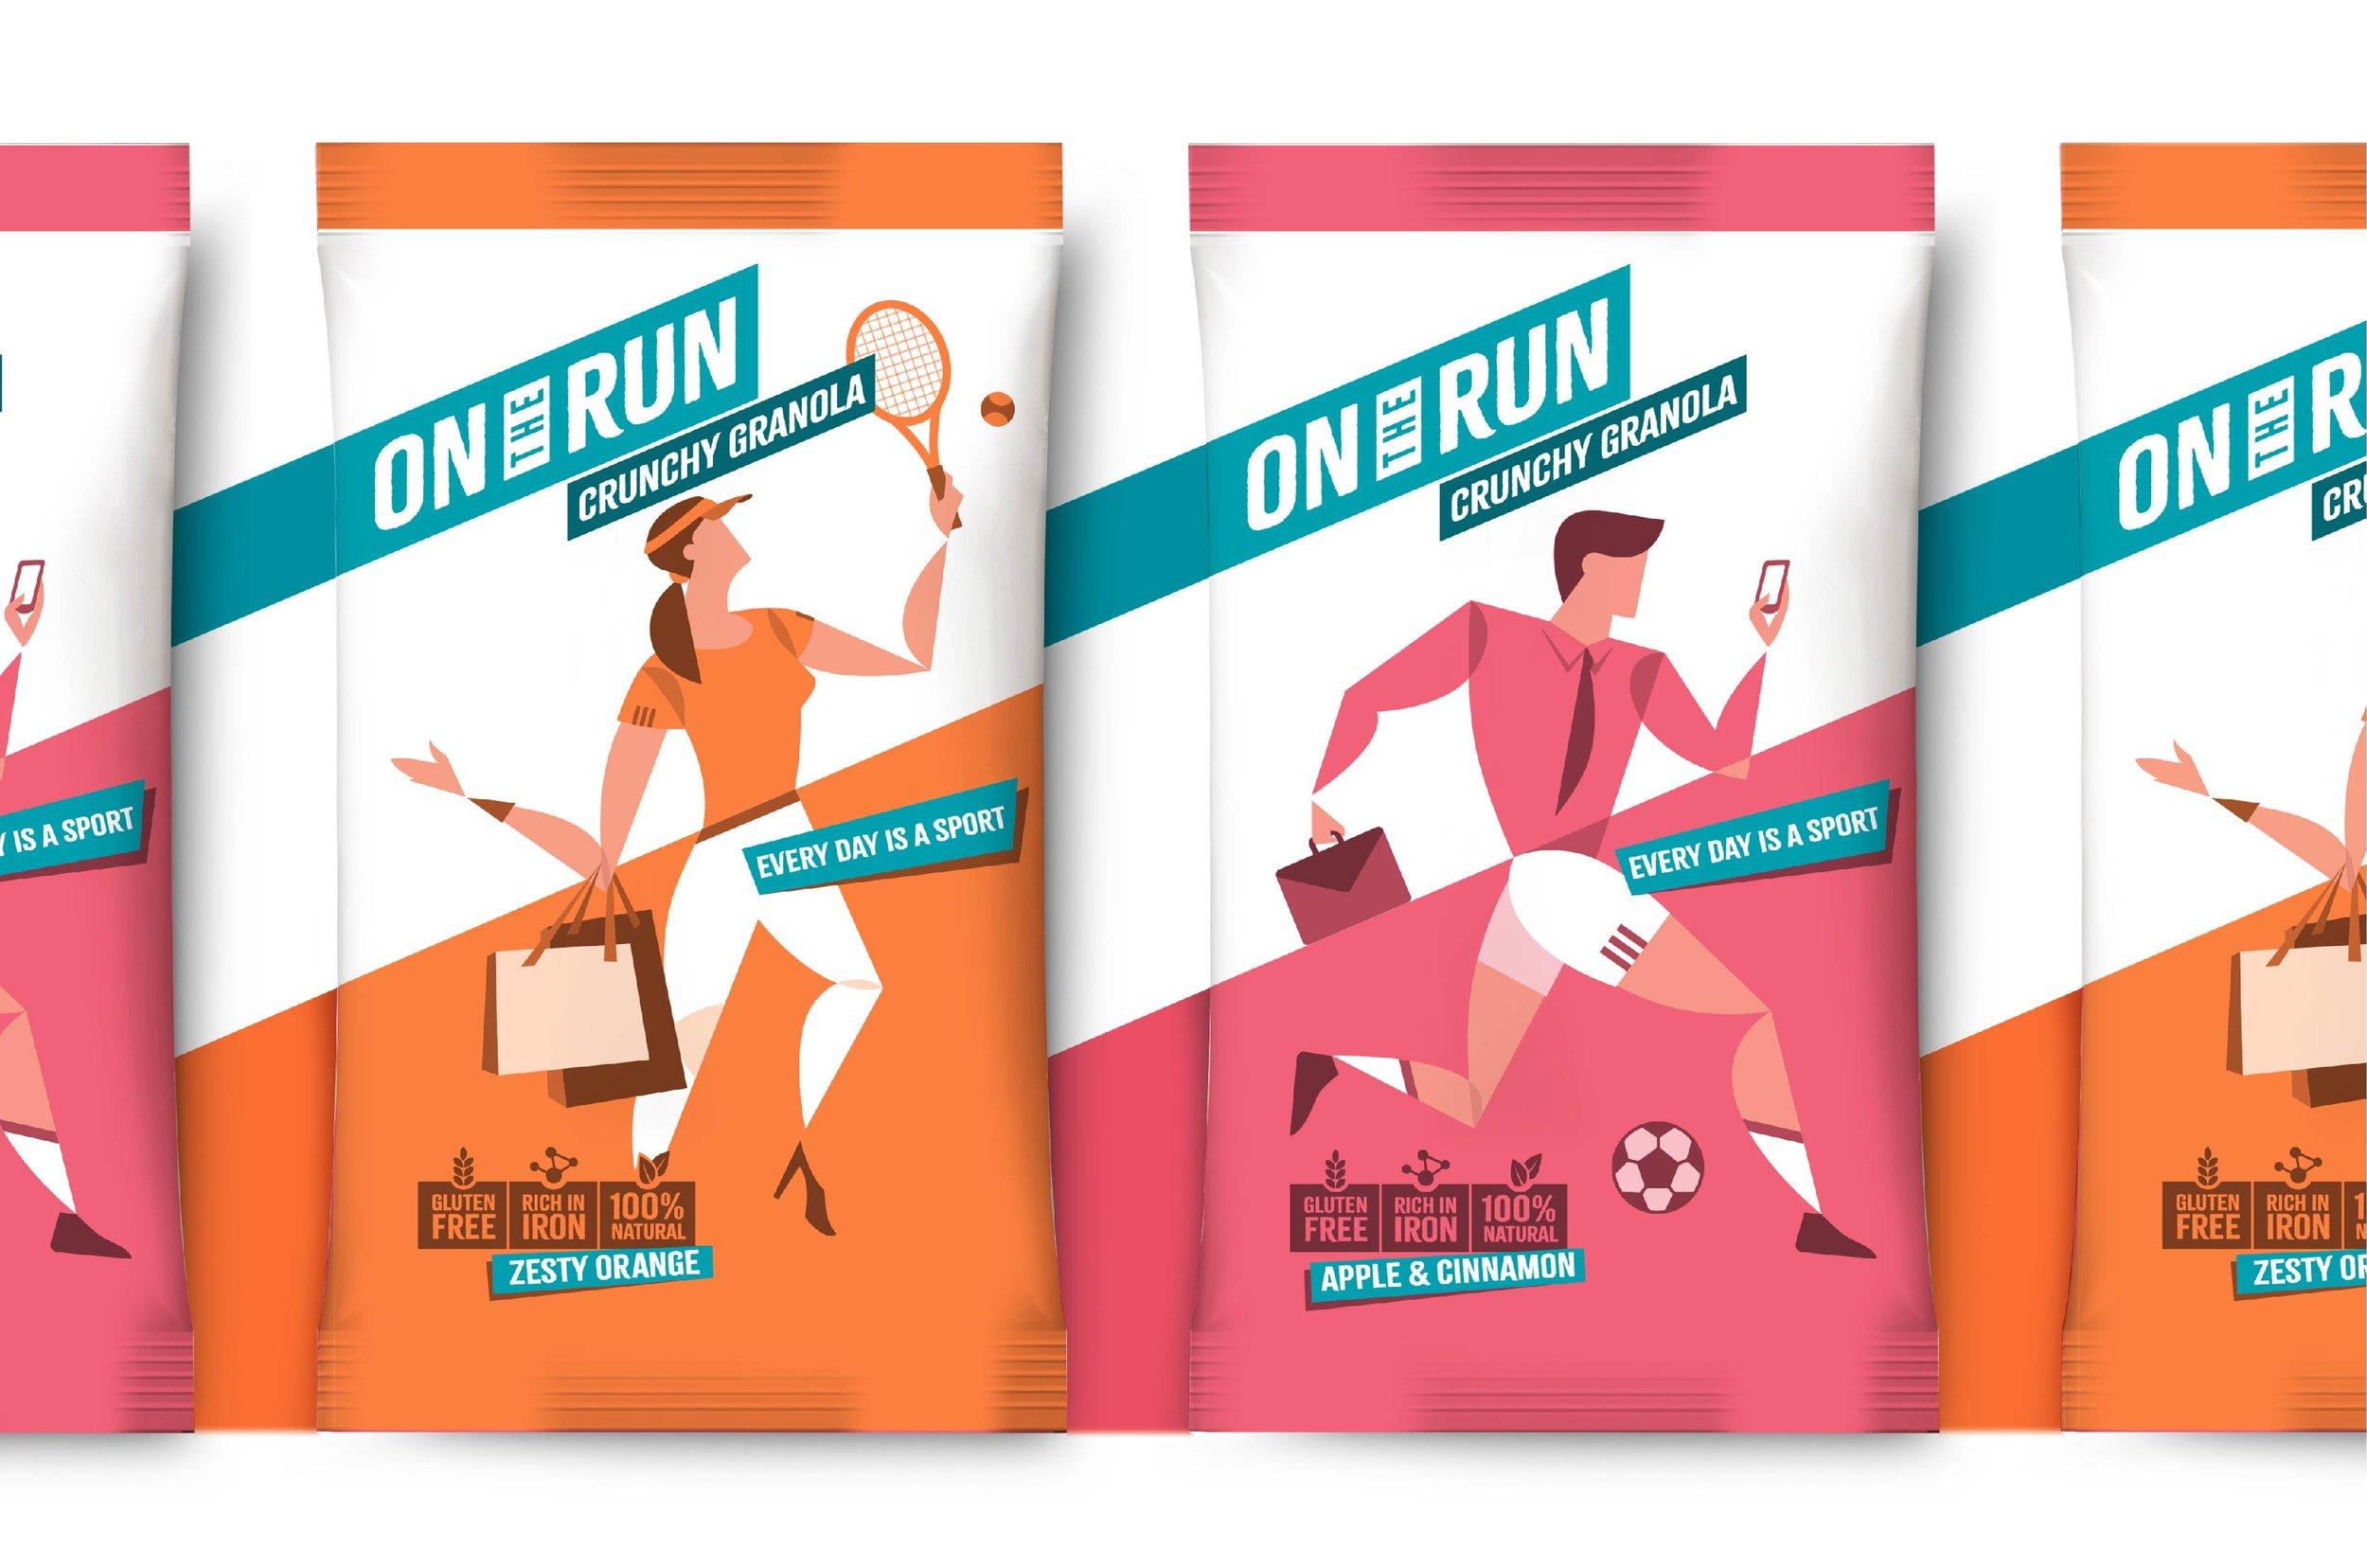 On The Run_Packaging_Elephant Design 5.jpg